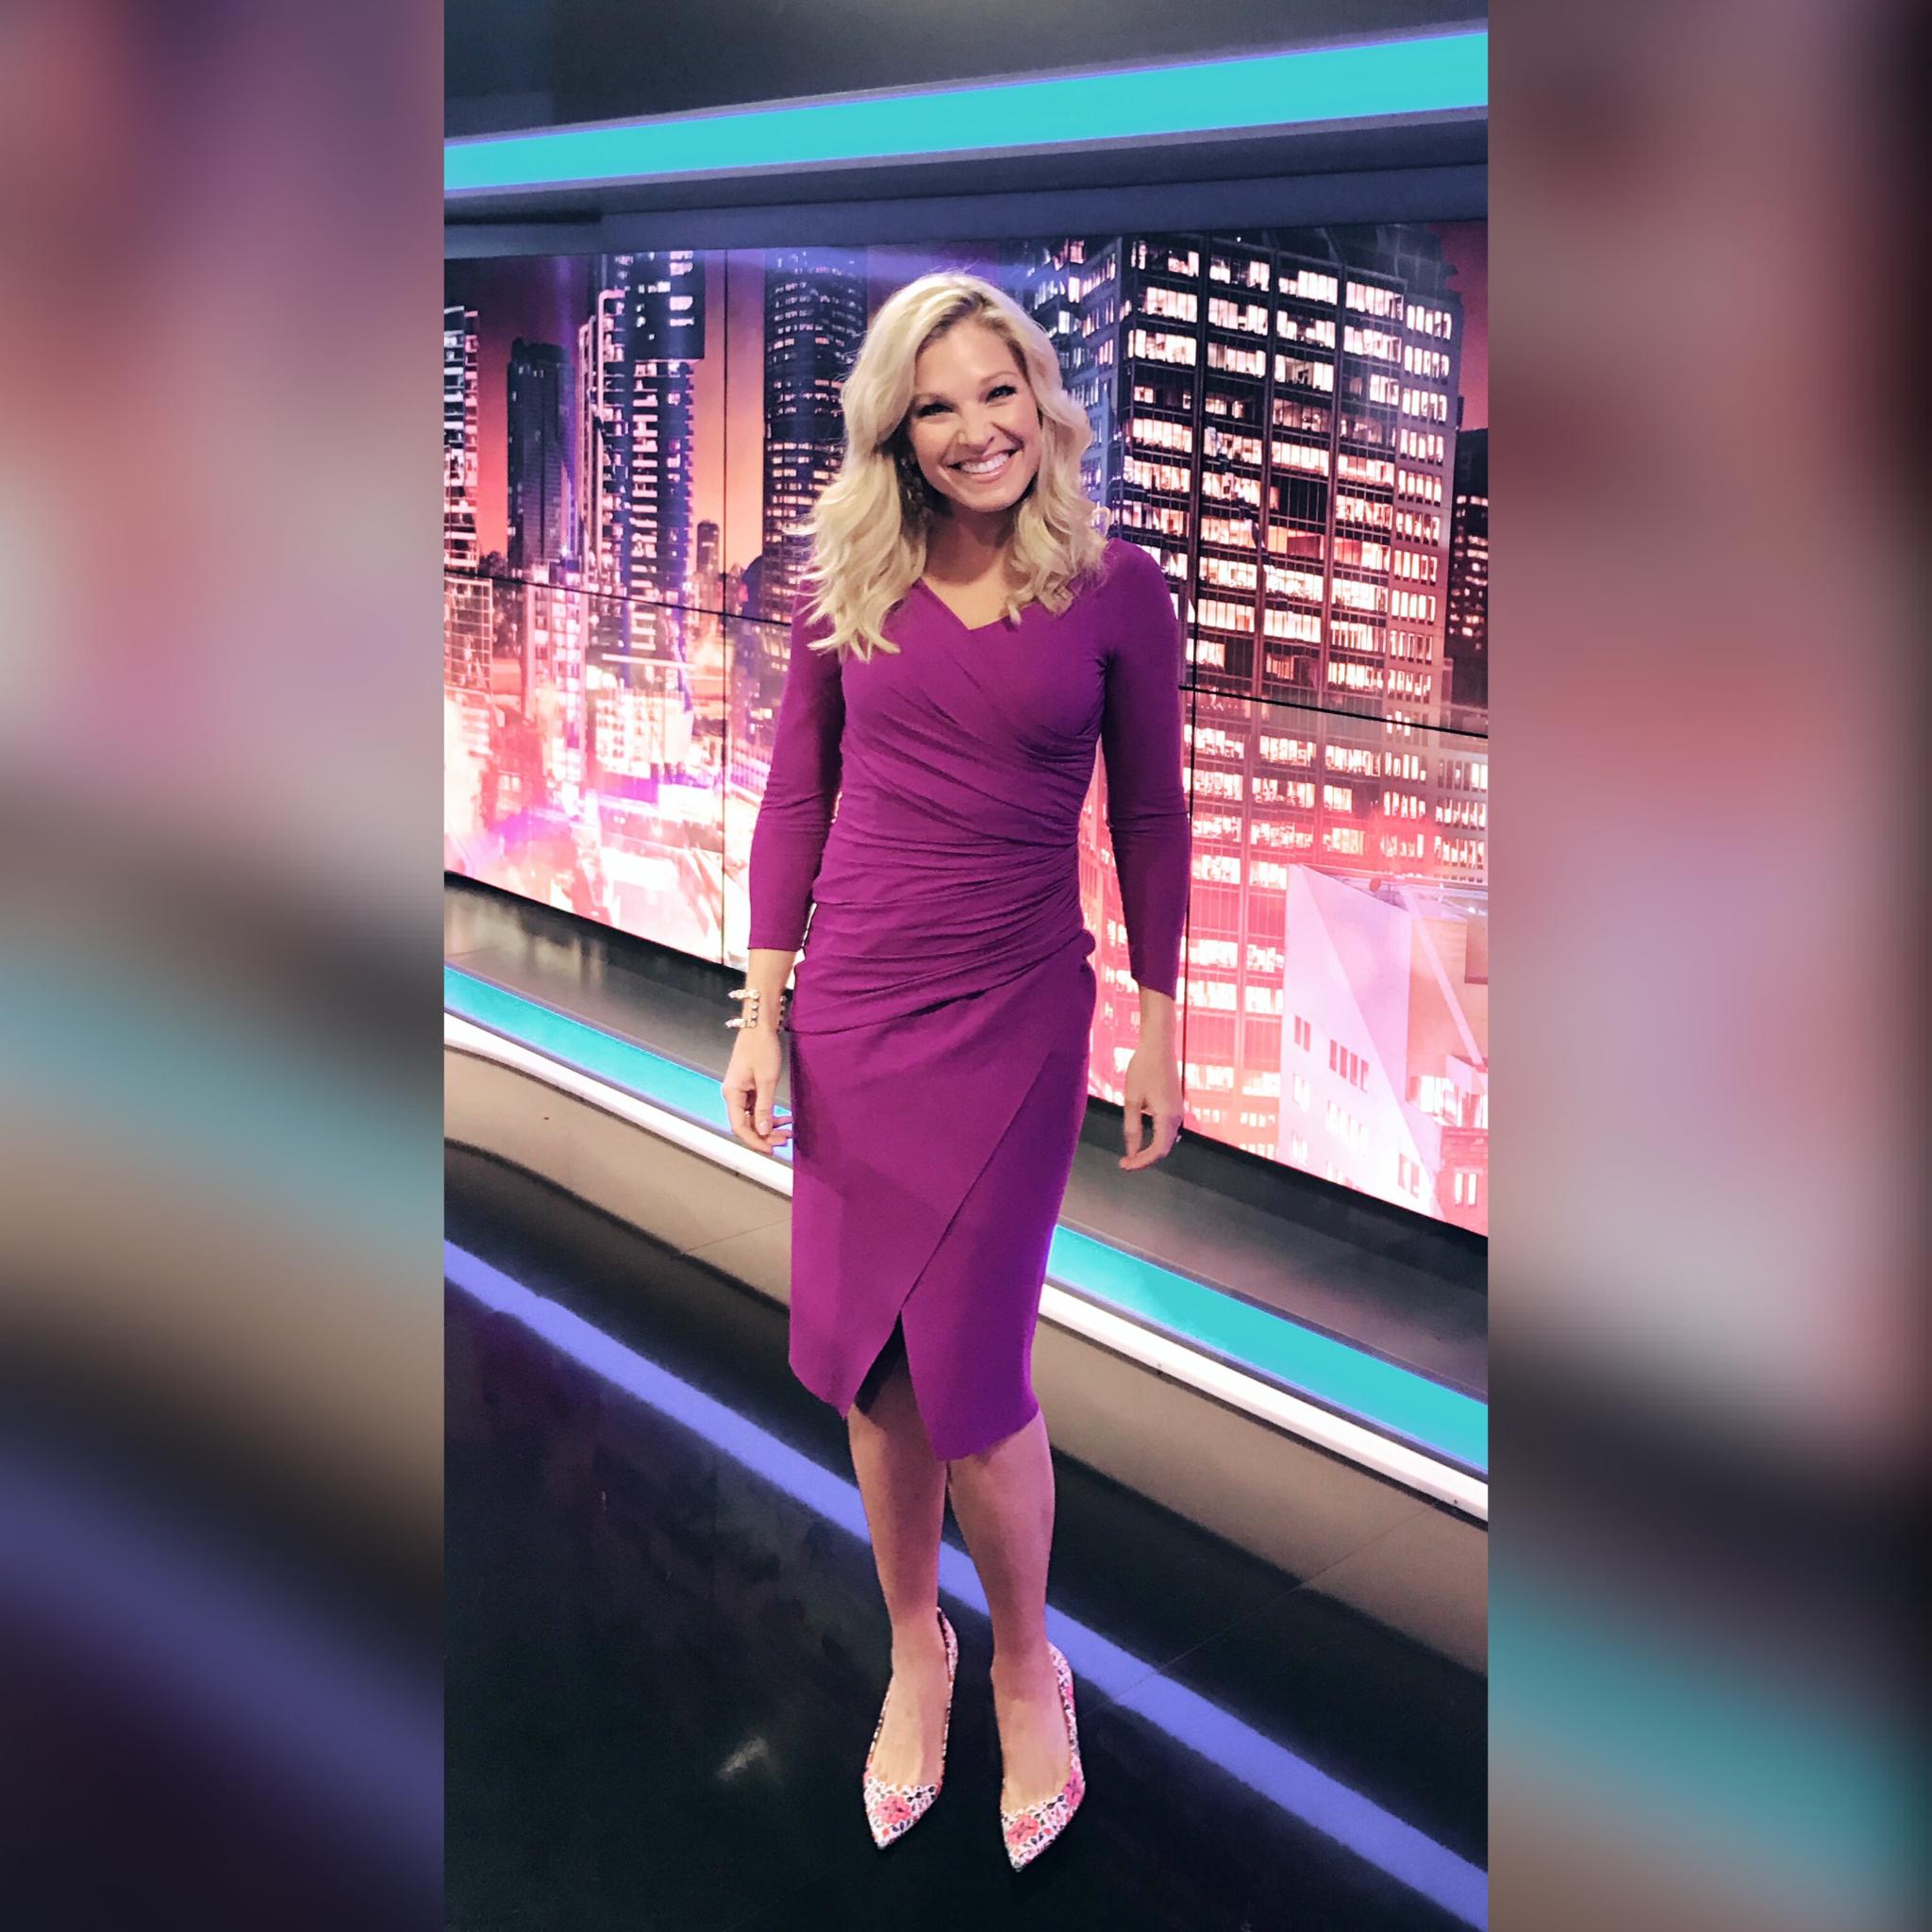 Anna Kooiman Sky News May 2017 la petite robe dress australia sydney tv news bondi beach fitness travel lifestyle The Sky's the Limit for Fuchsia